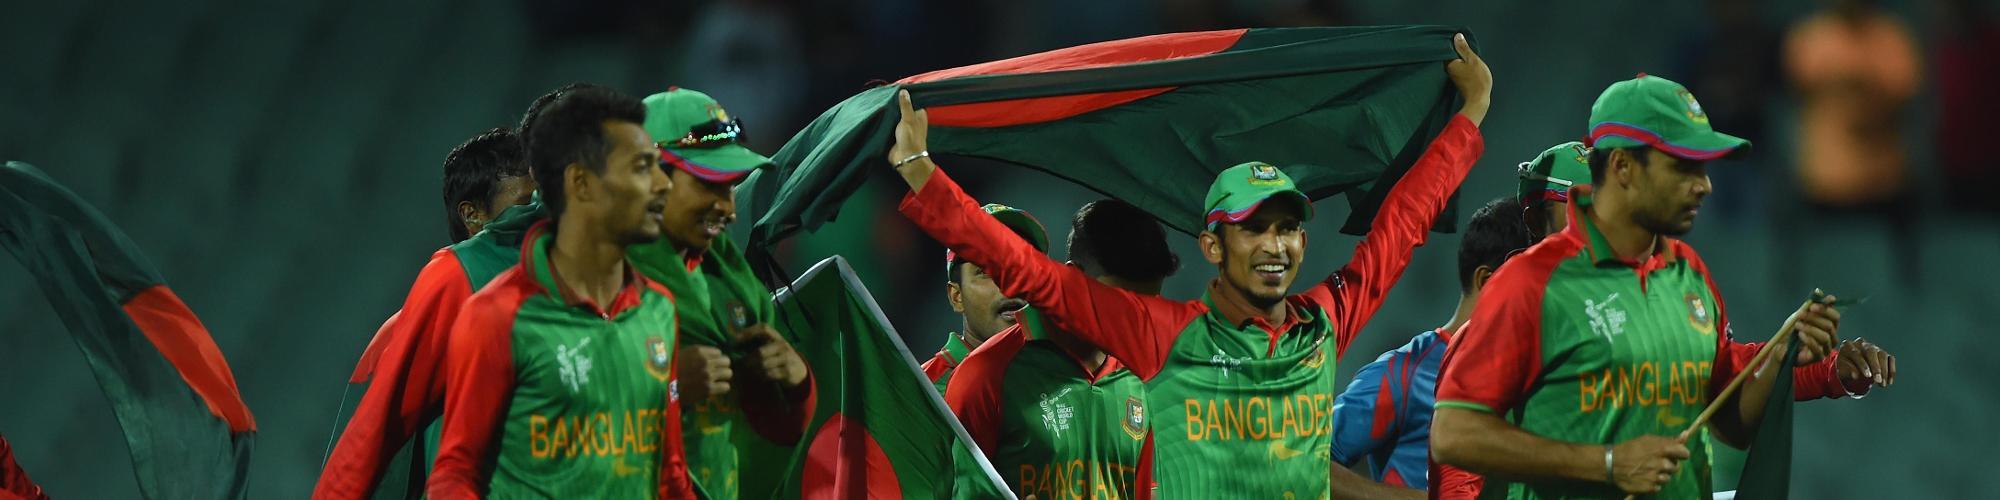 Bangladesh 1.jpg